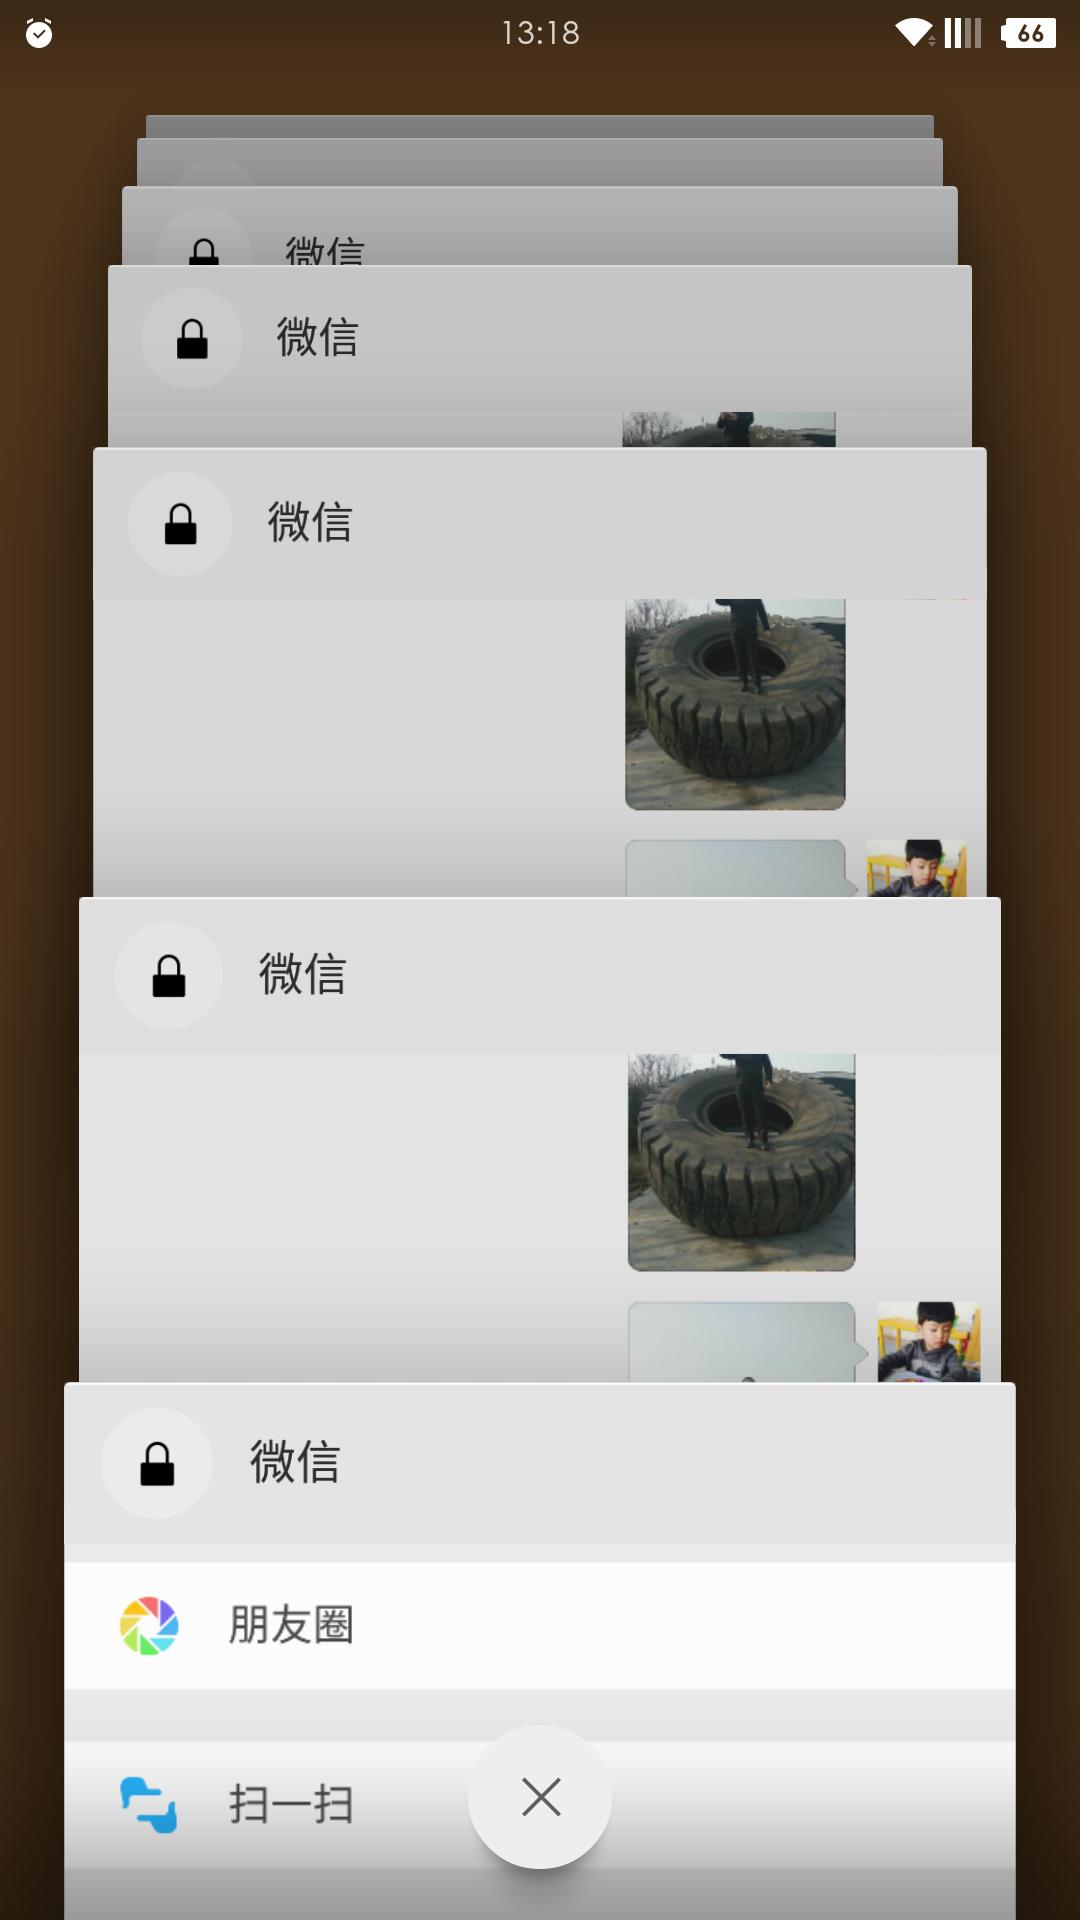 Screenshot_2015-12-23-13-18-22.png